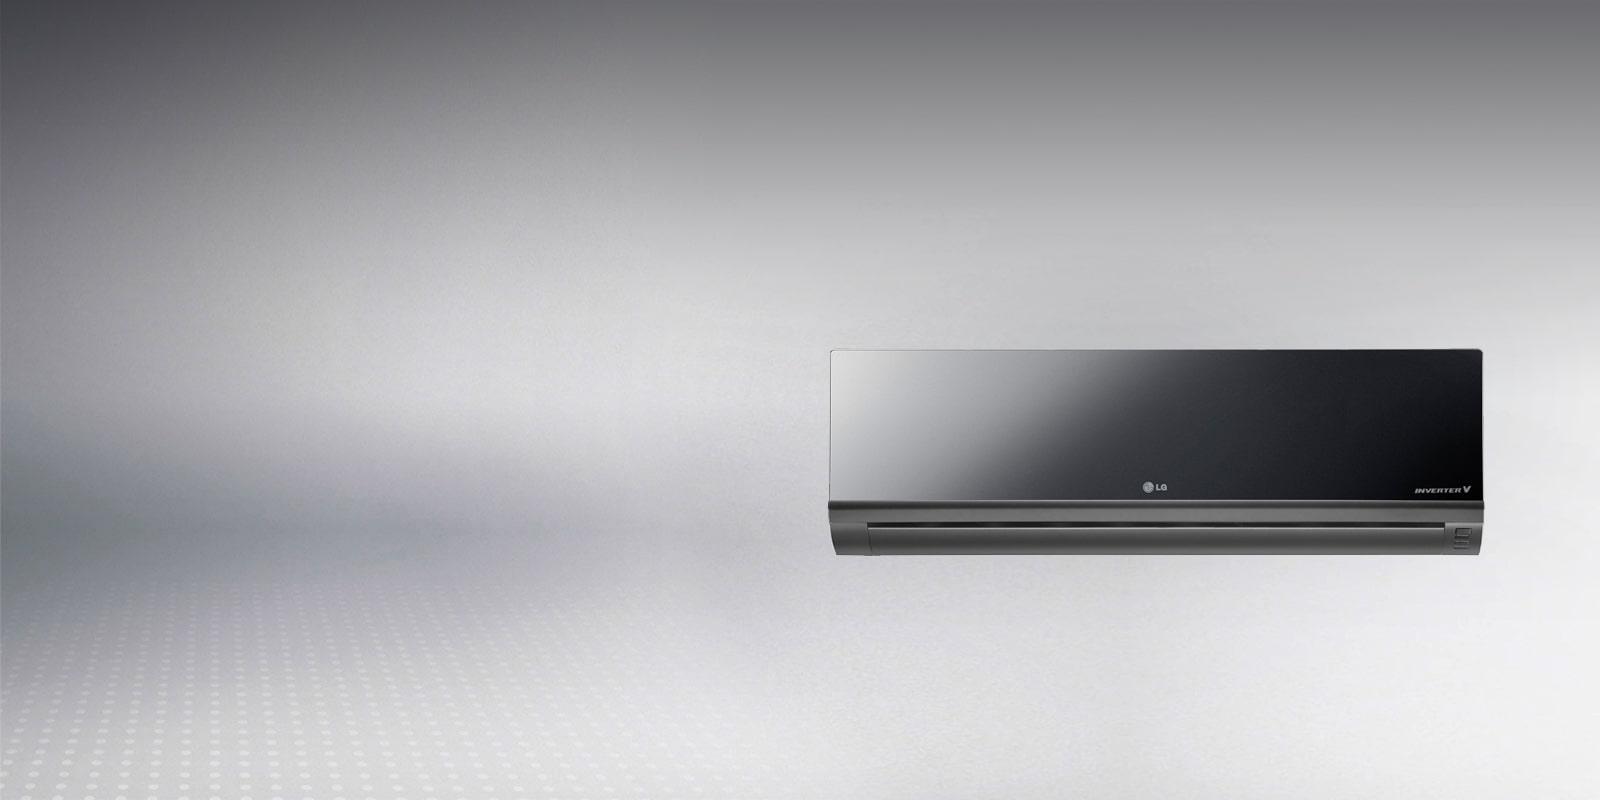 Ar Condicionado Controle De Temperatura Lg Portugal